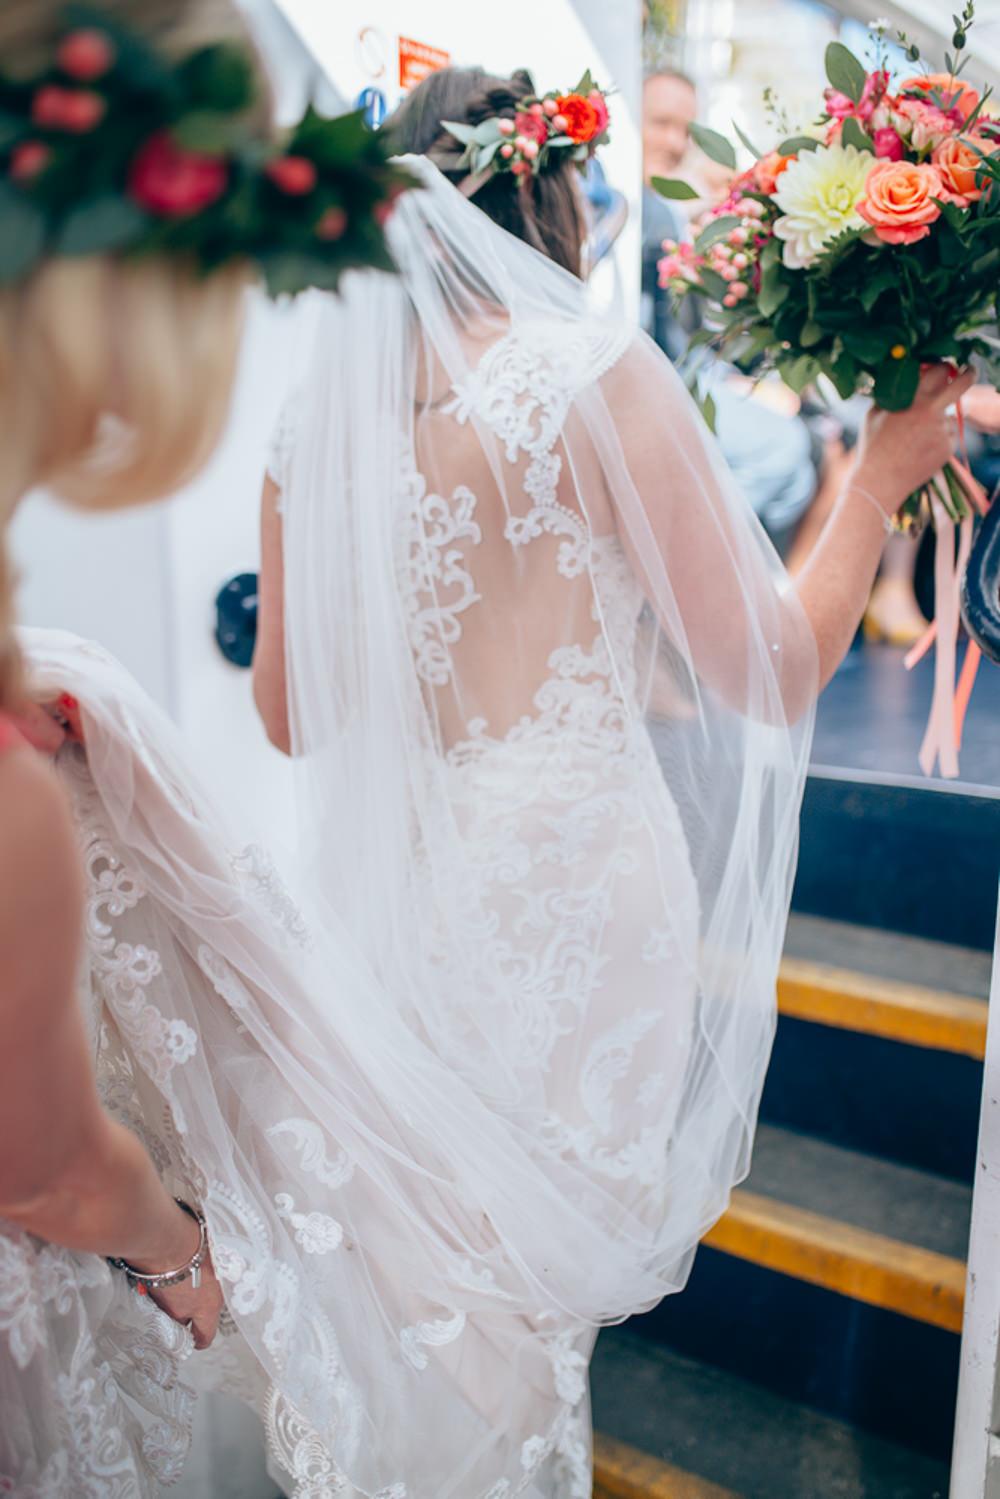 Dress Gown Bride Bridal Veil Lace Train Village Hall Wedding Samantha Kay Photography